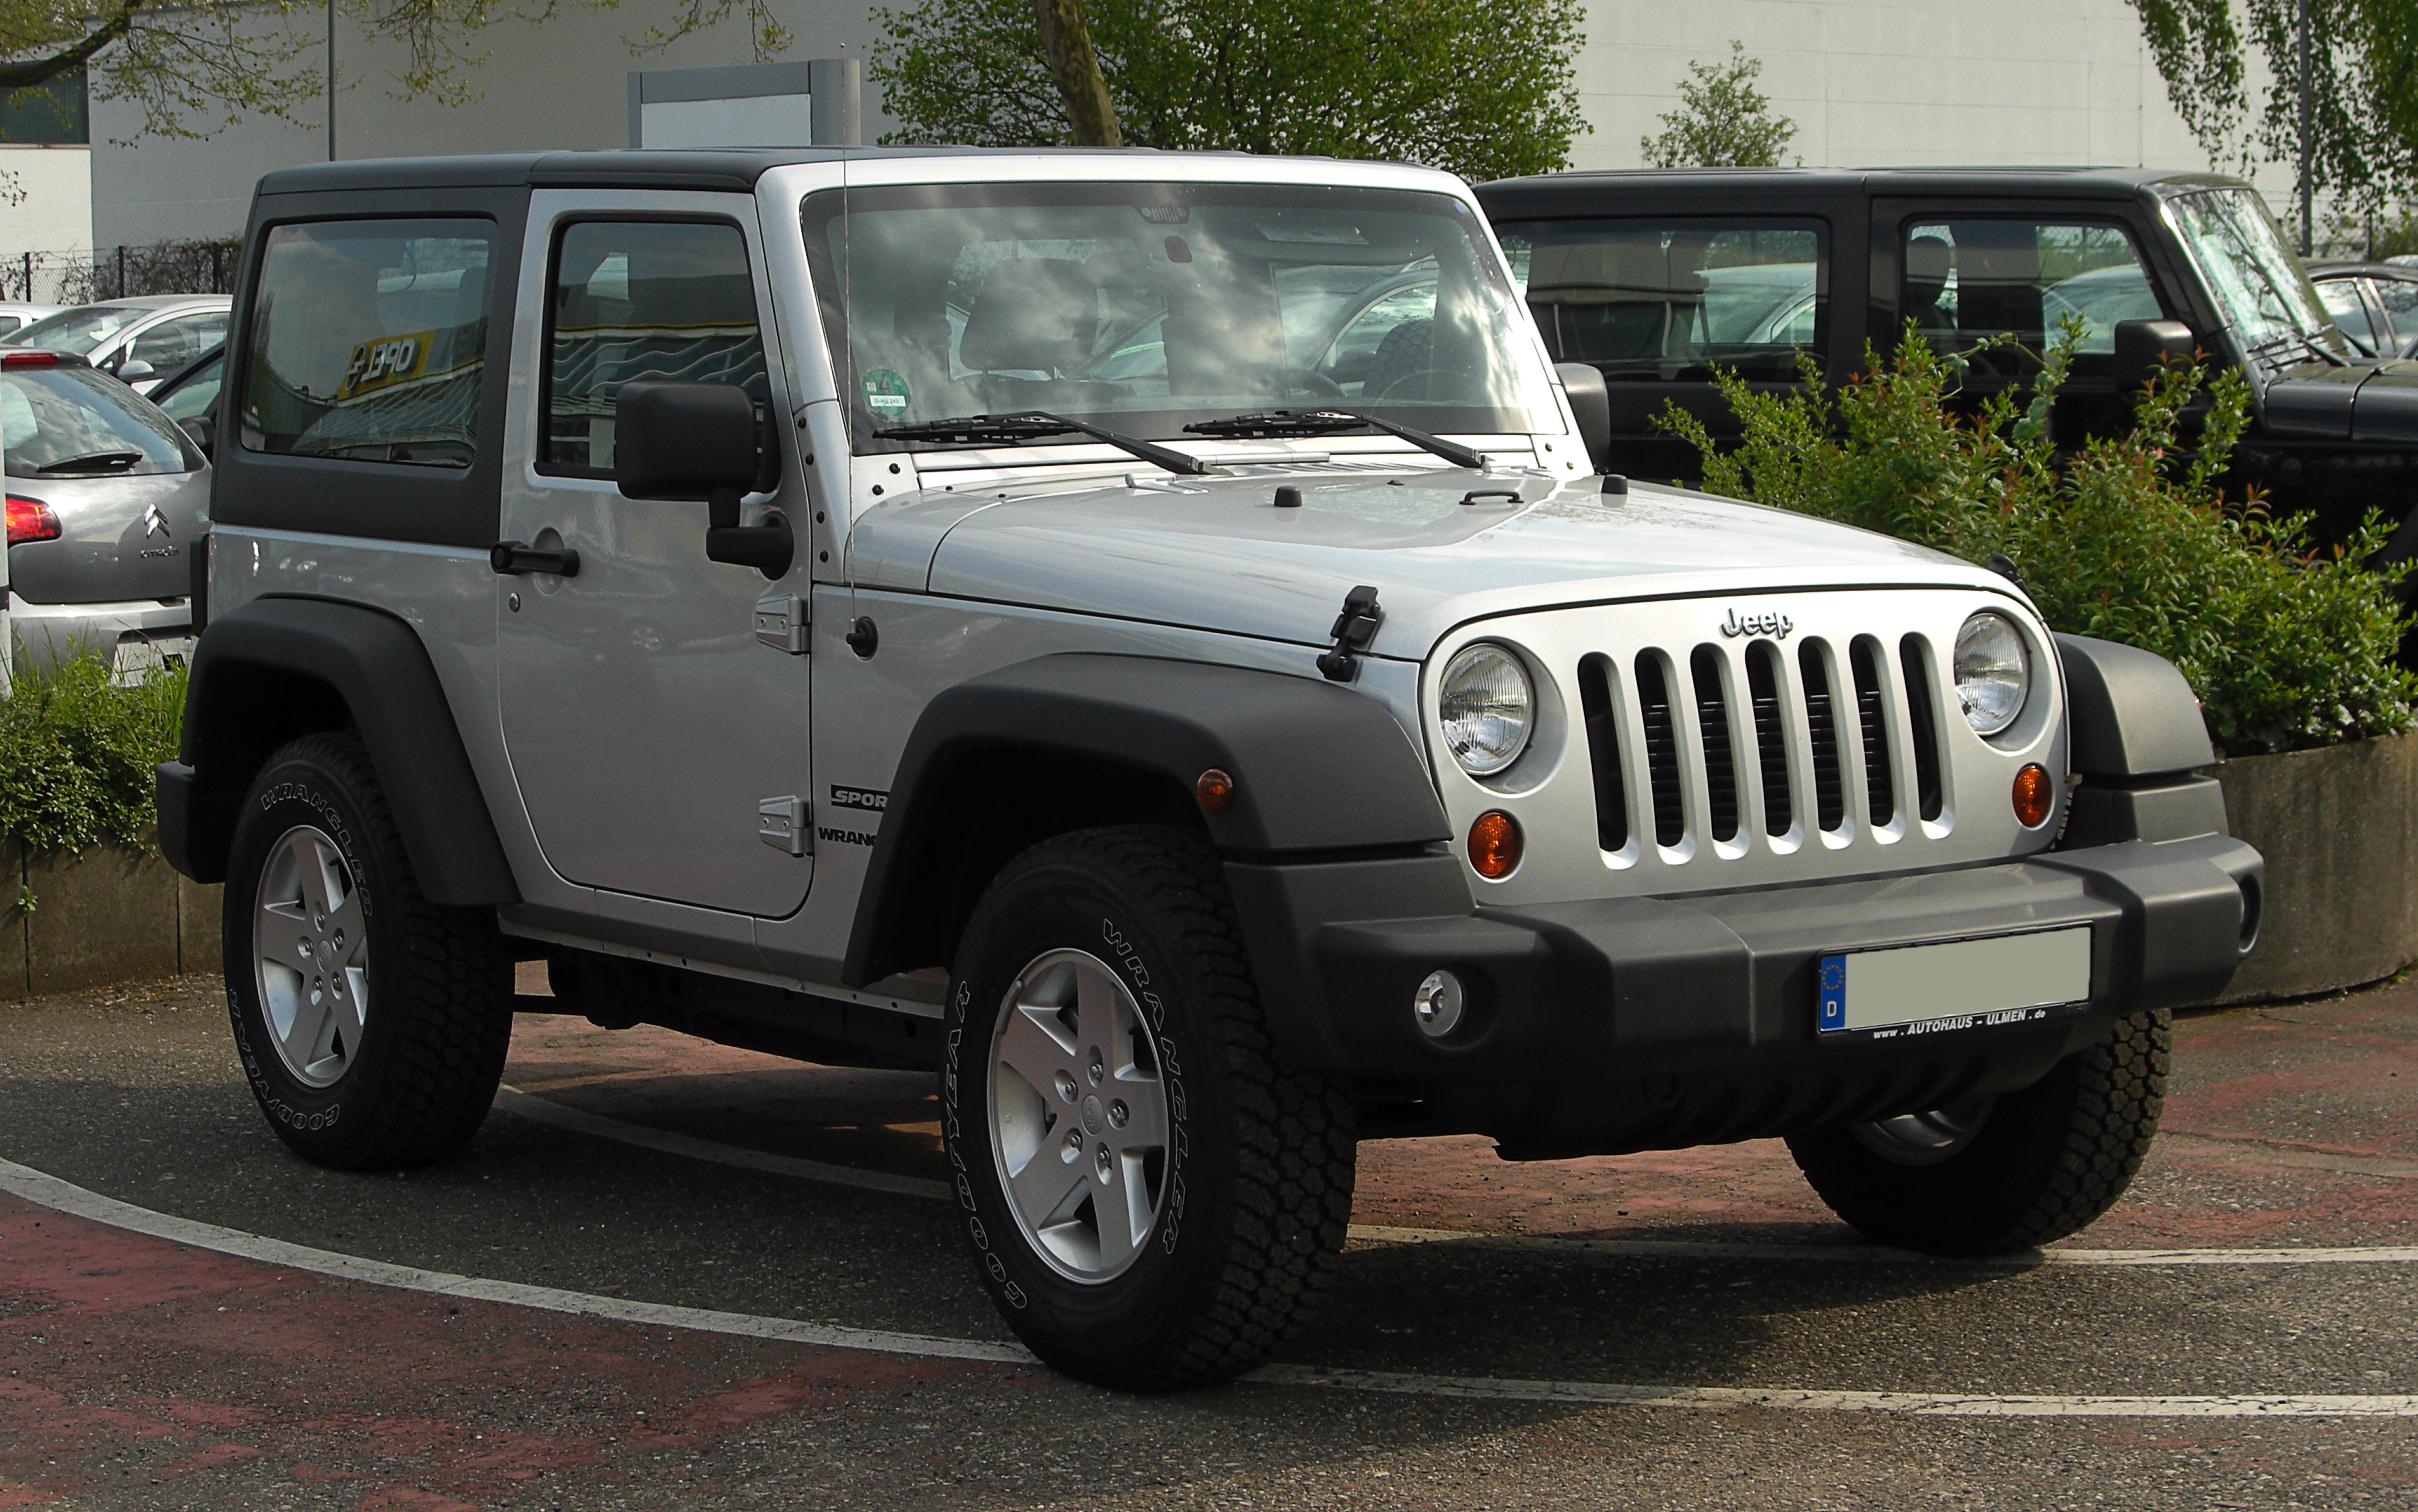 199 Jeep wrangler sport #2